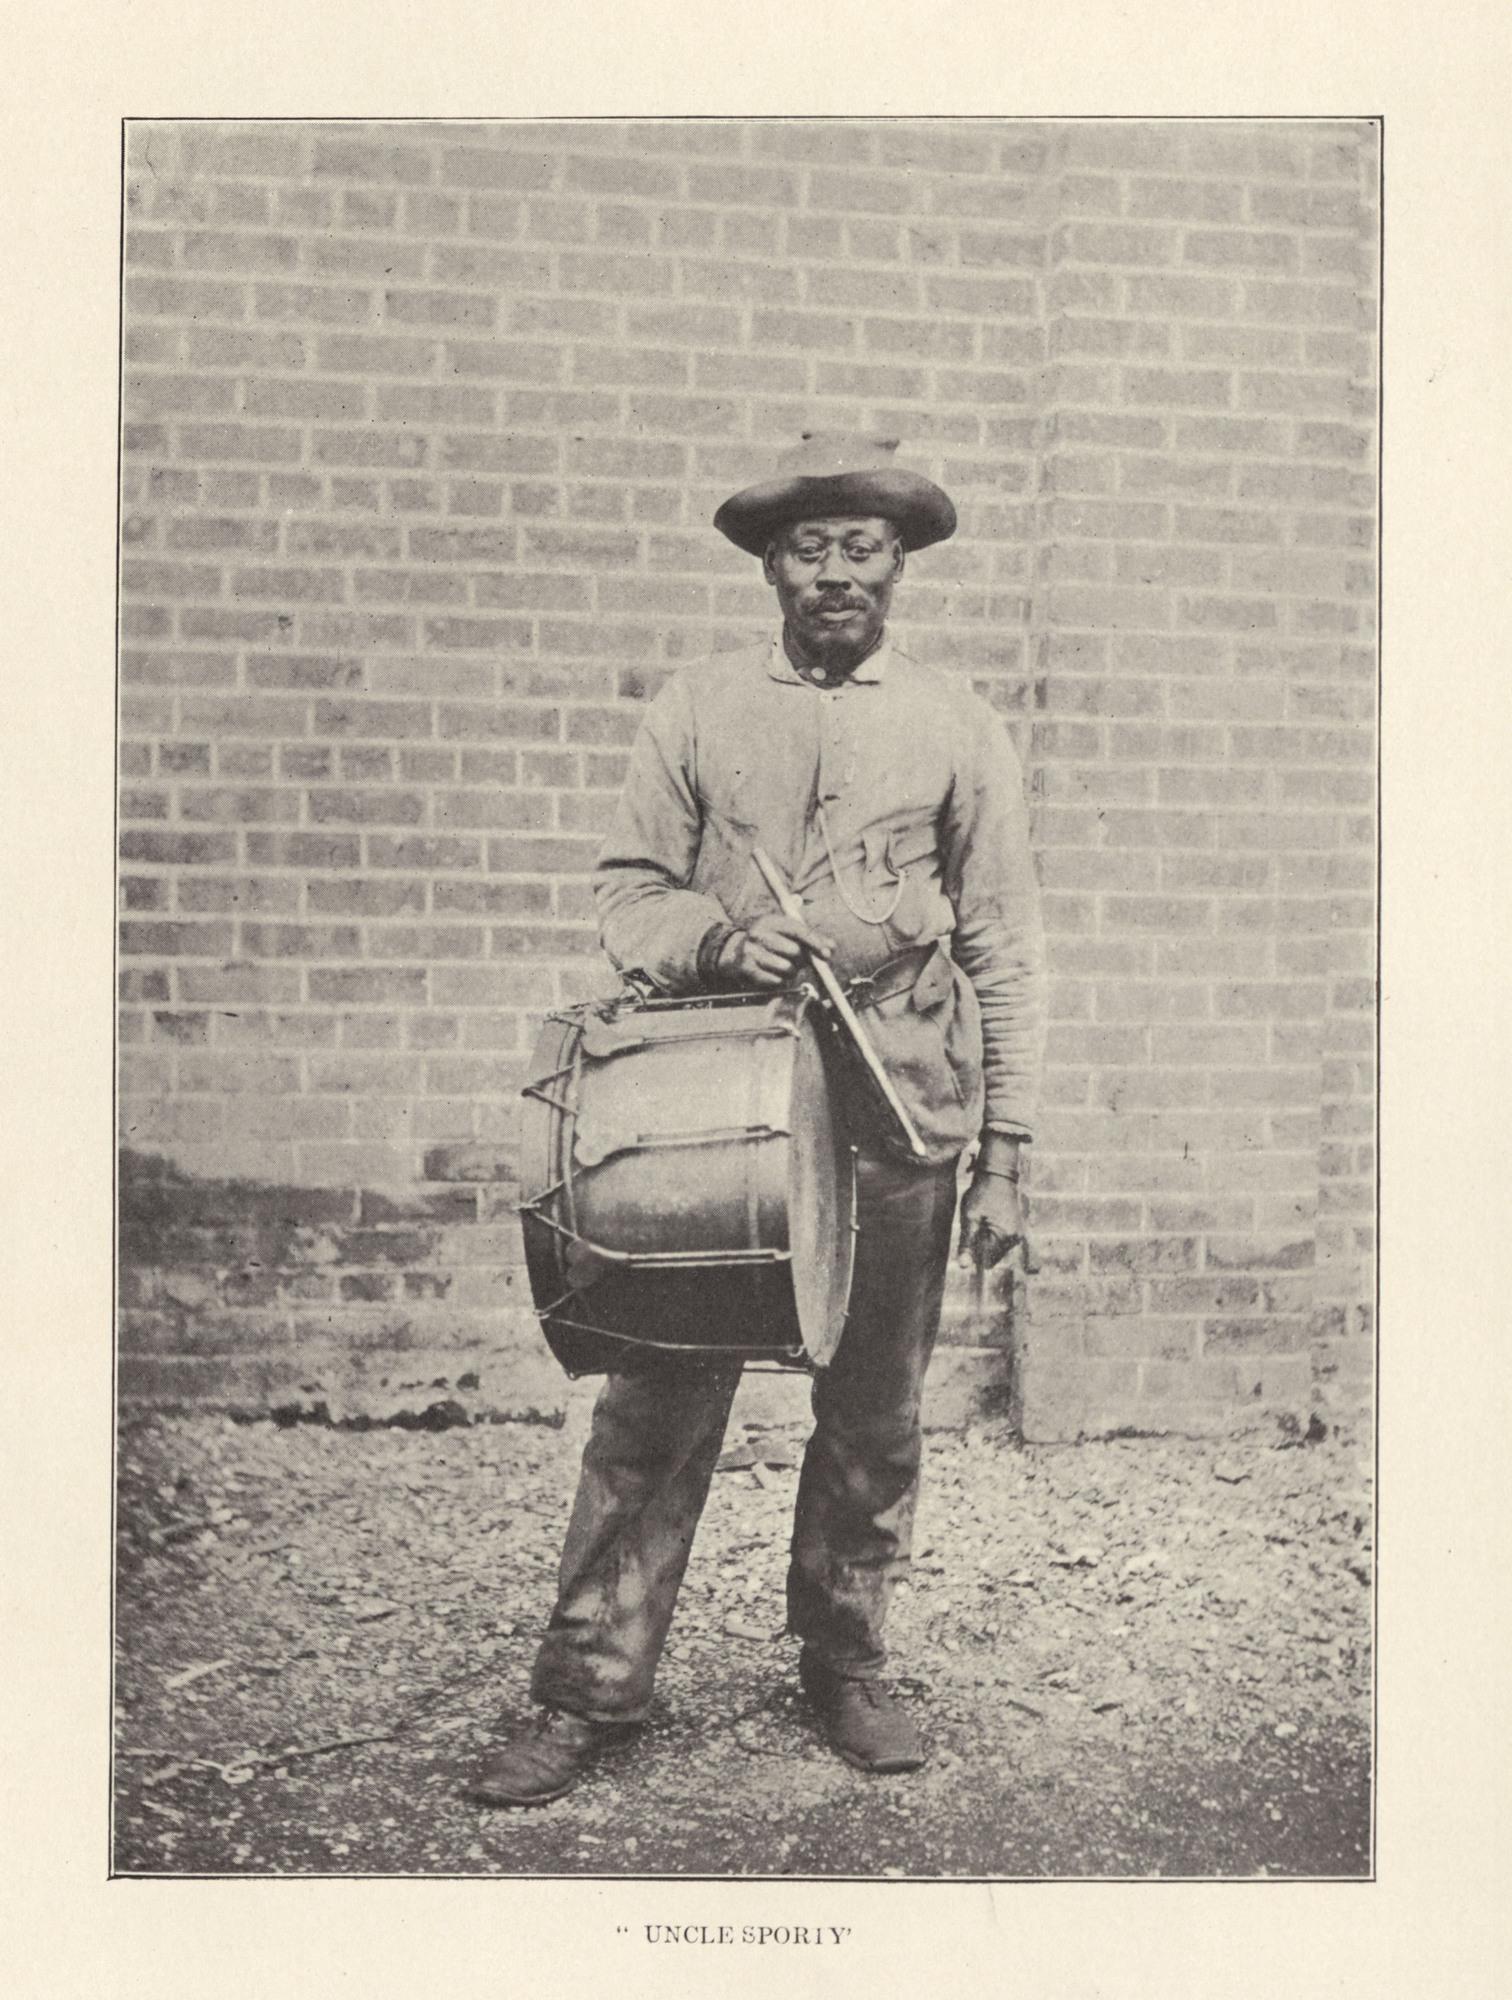 http://spec.lib.vt.edu/pickup/Omeka_upload/UncleSporty_1906.jpg